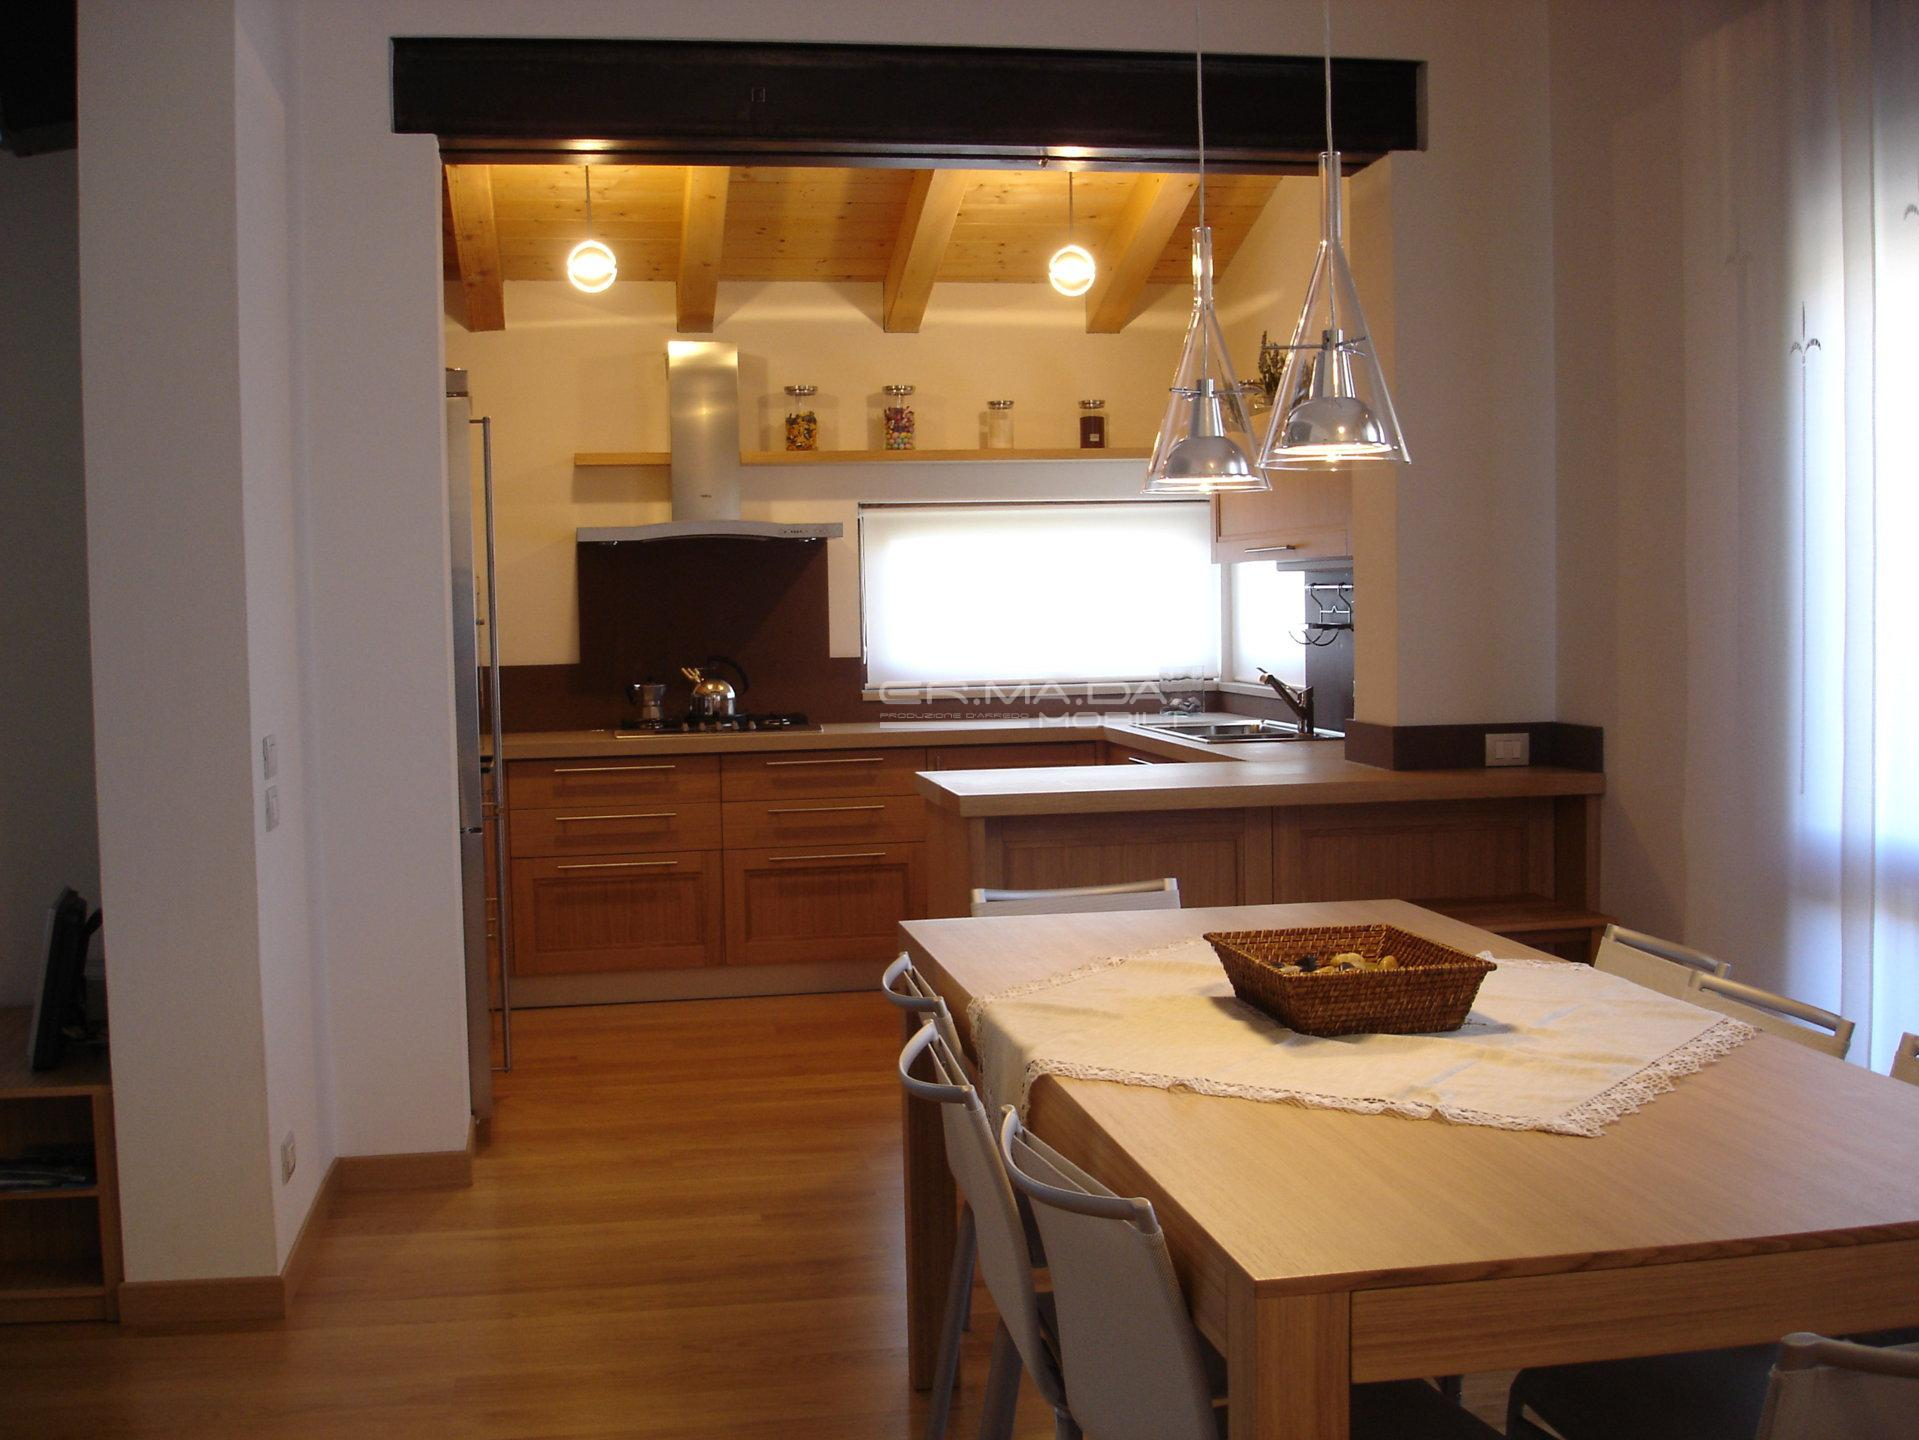 7 cucina rovere naturale a telaio - er. ma. da. mobilificio ... - Cucina Rovere Naturale